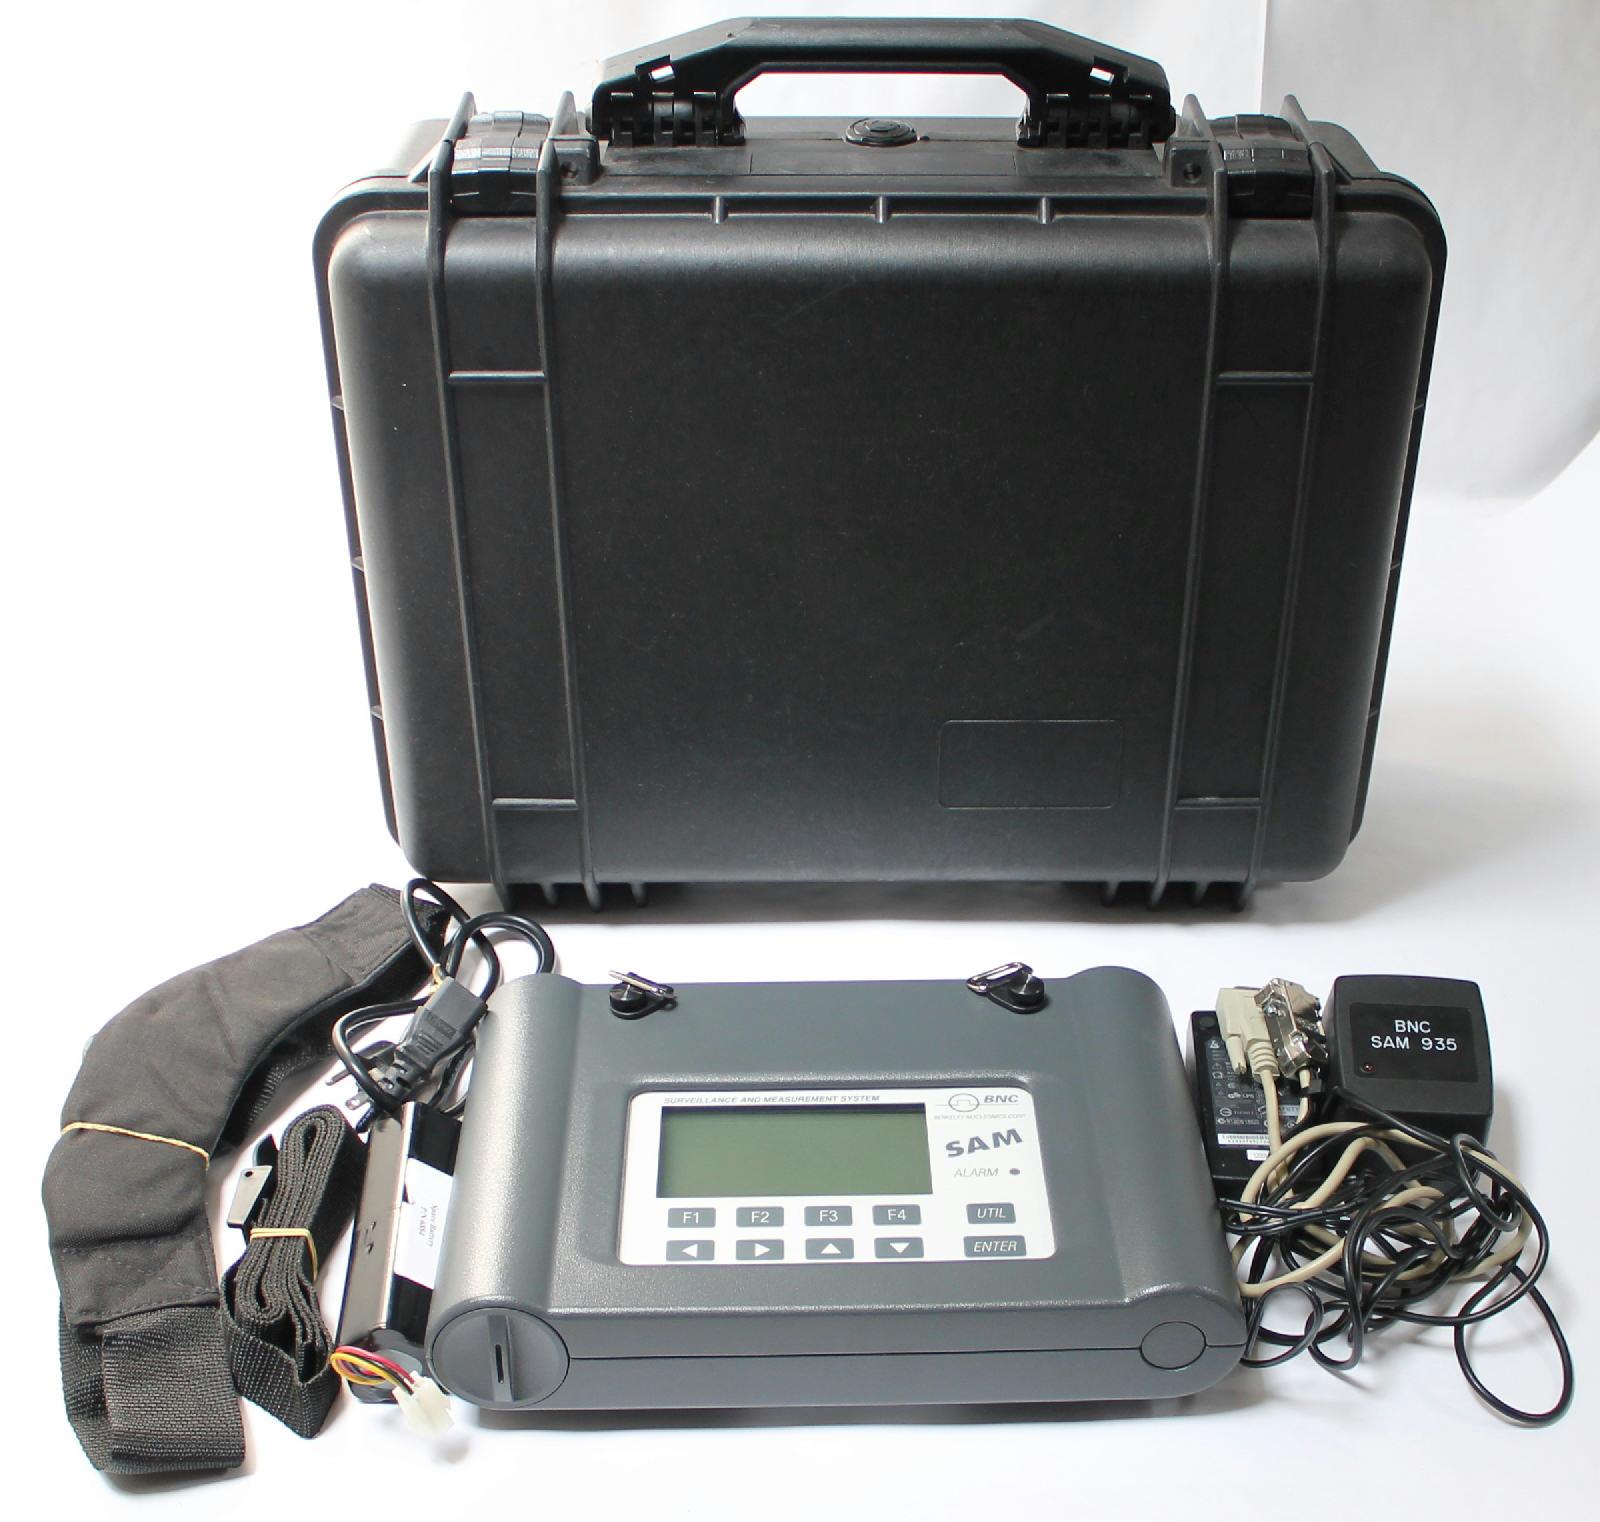 Berkeley Nucleonics Corp Bnc Model Sam 935 1b Portable